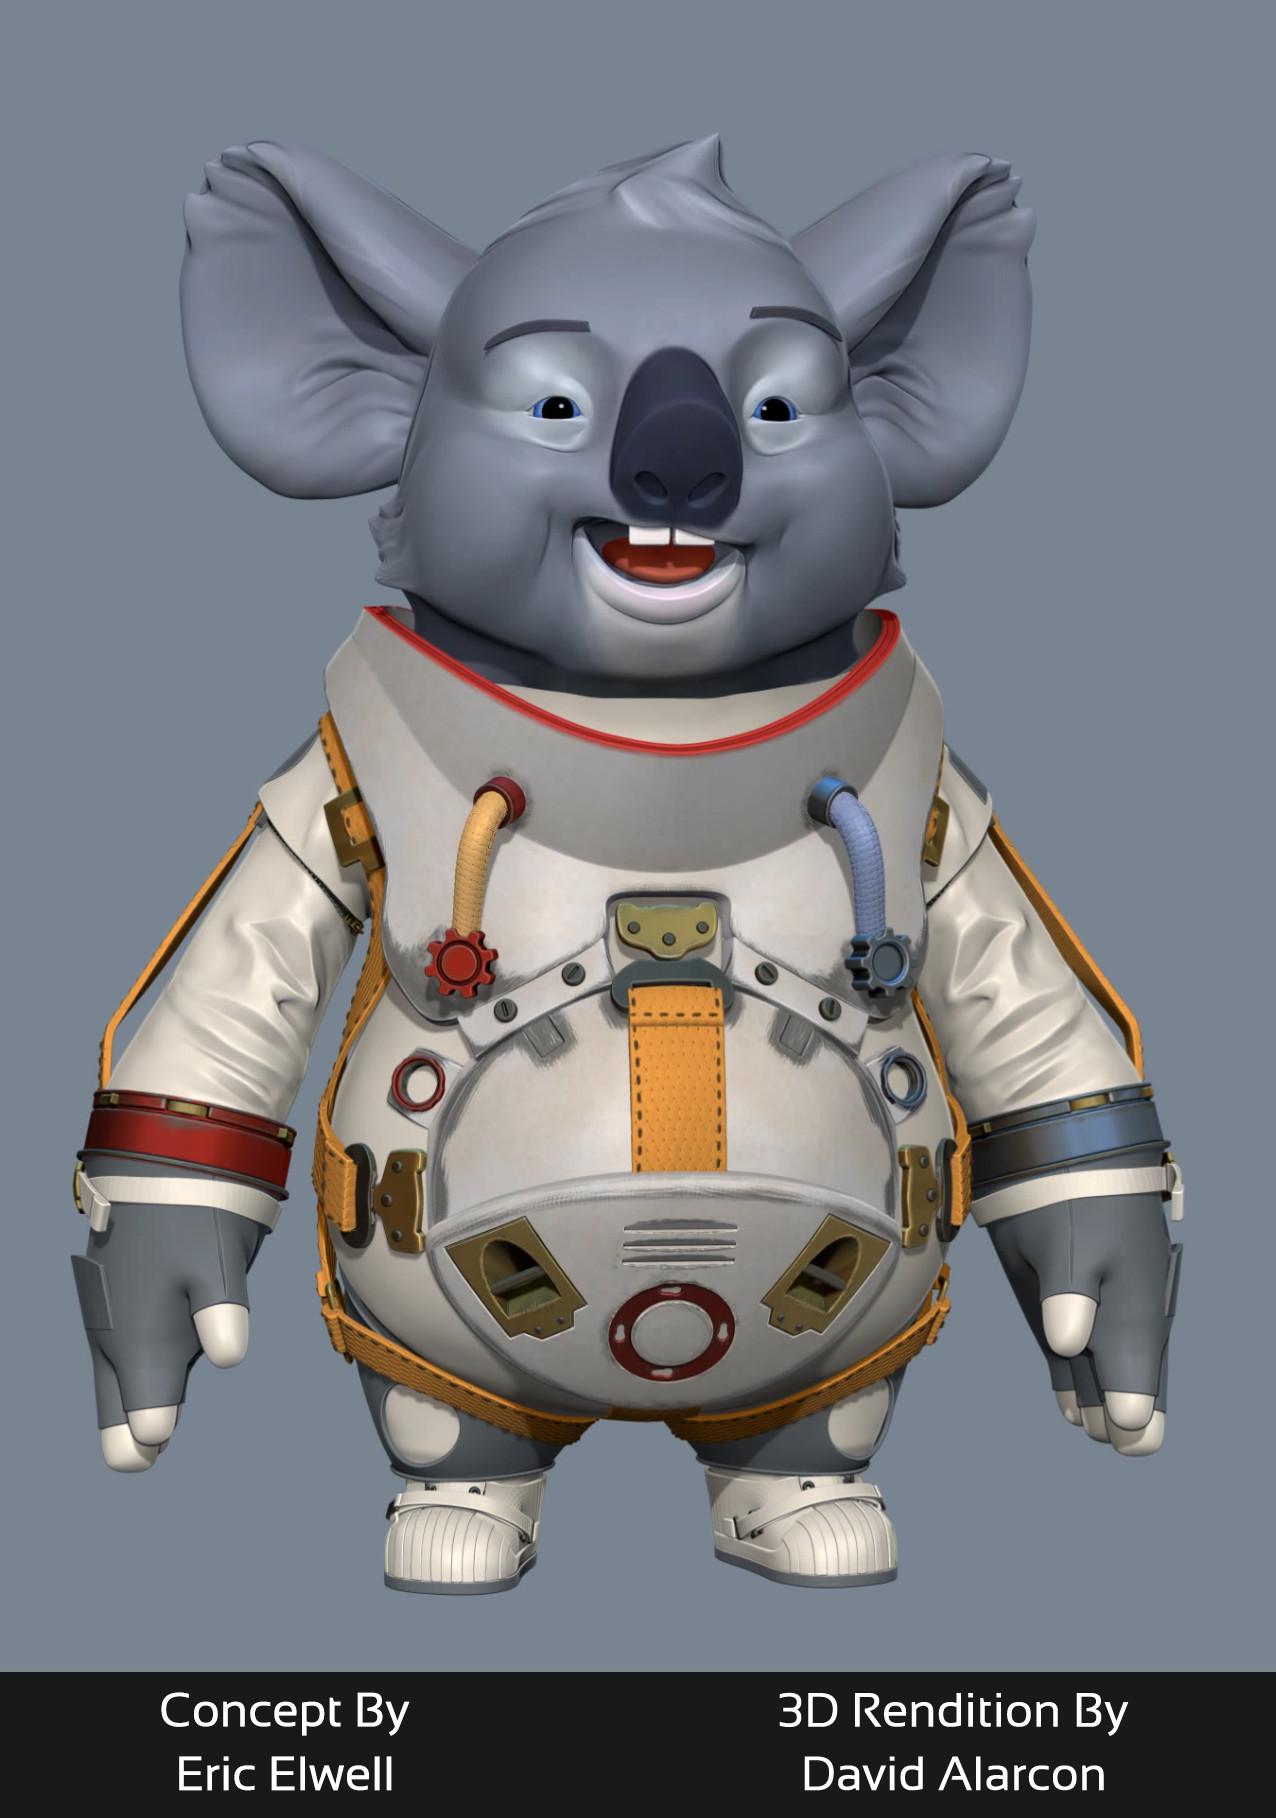 David alarcon koala wip